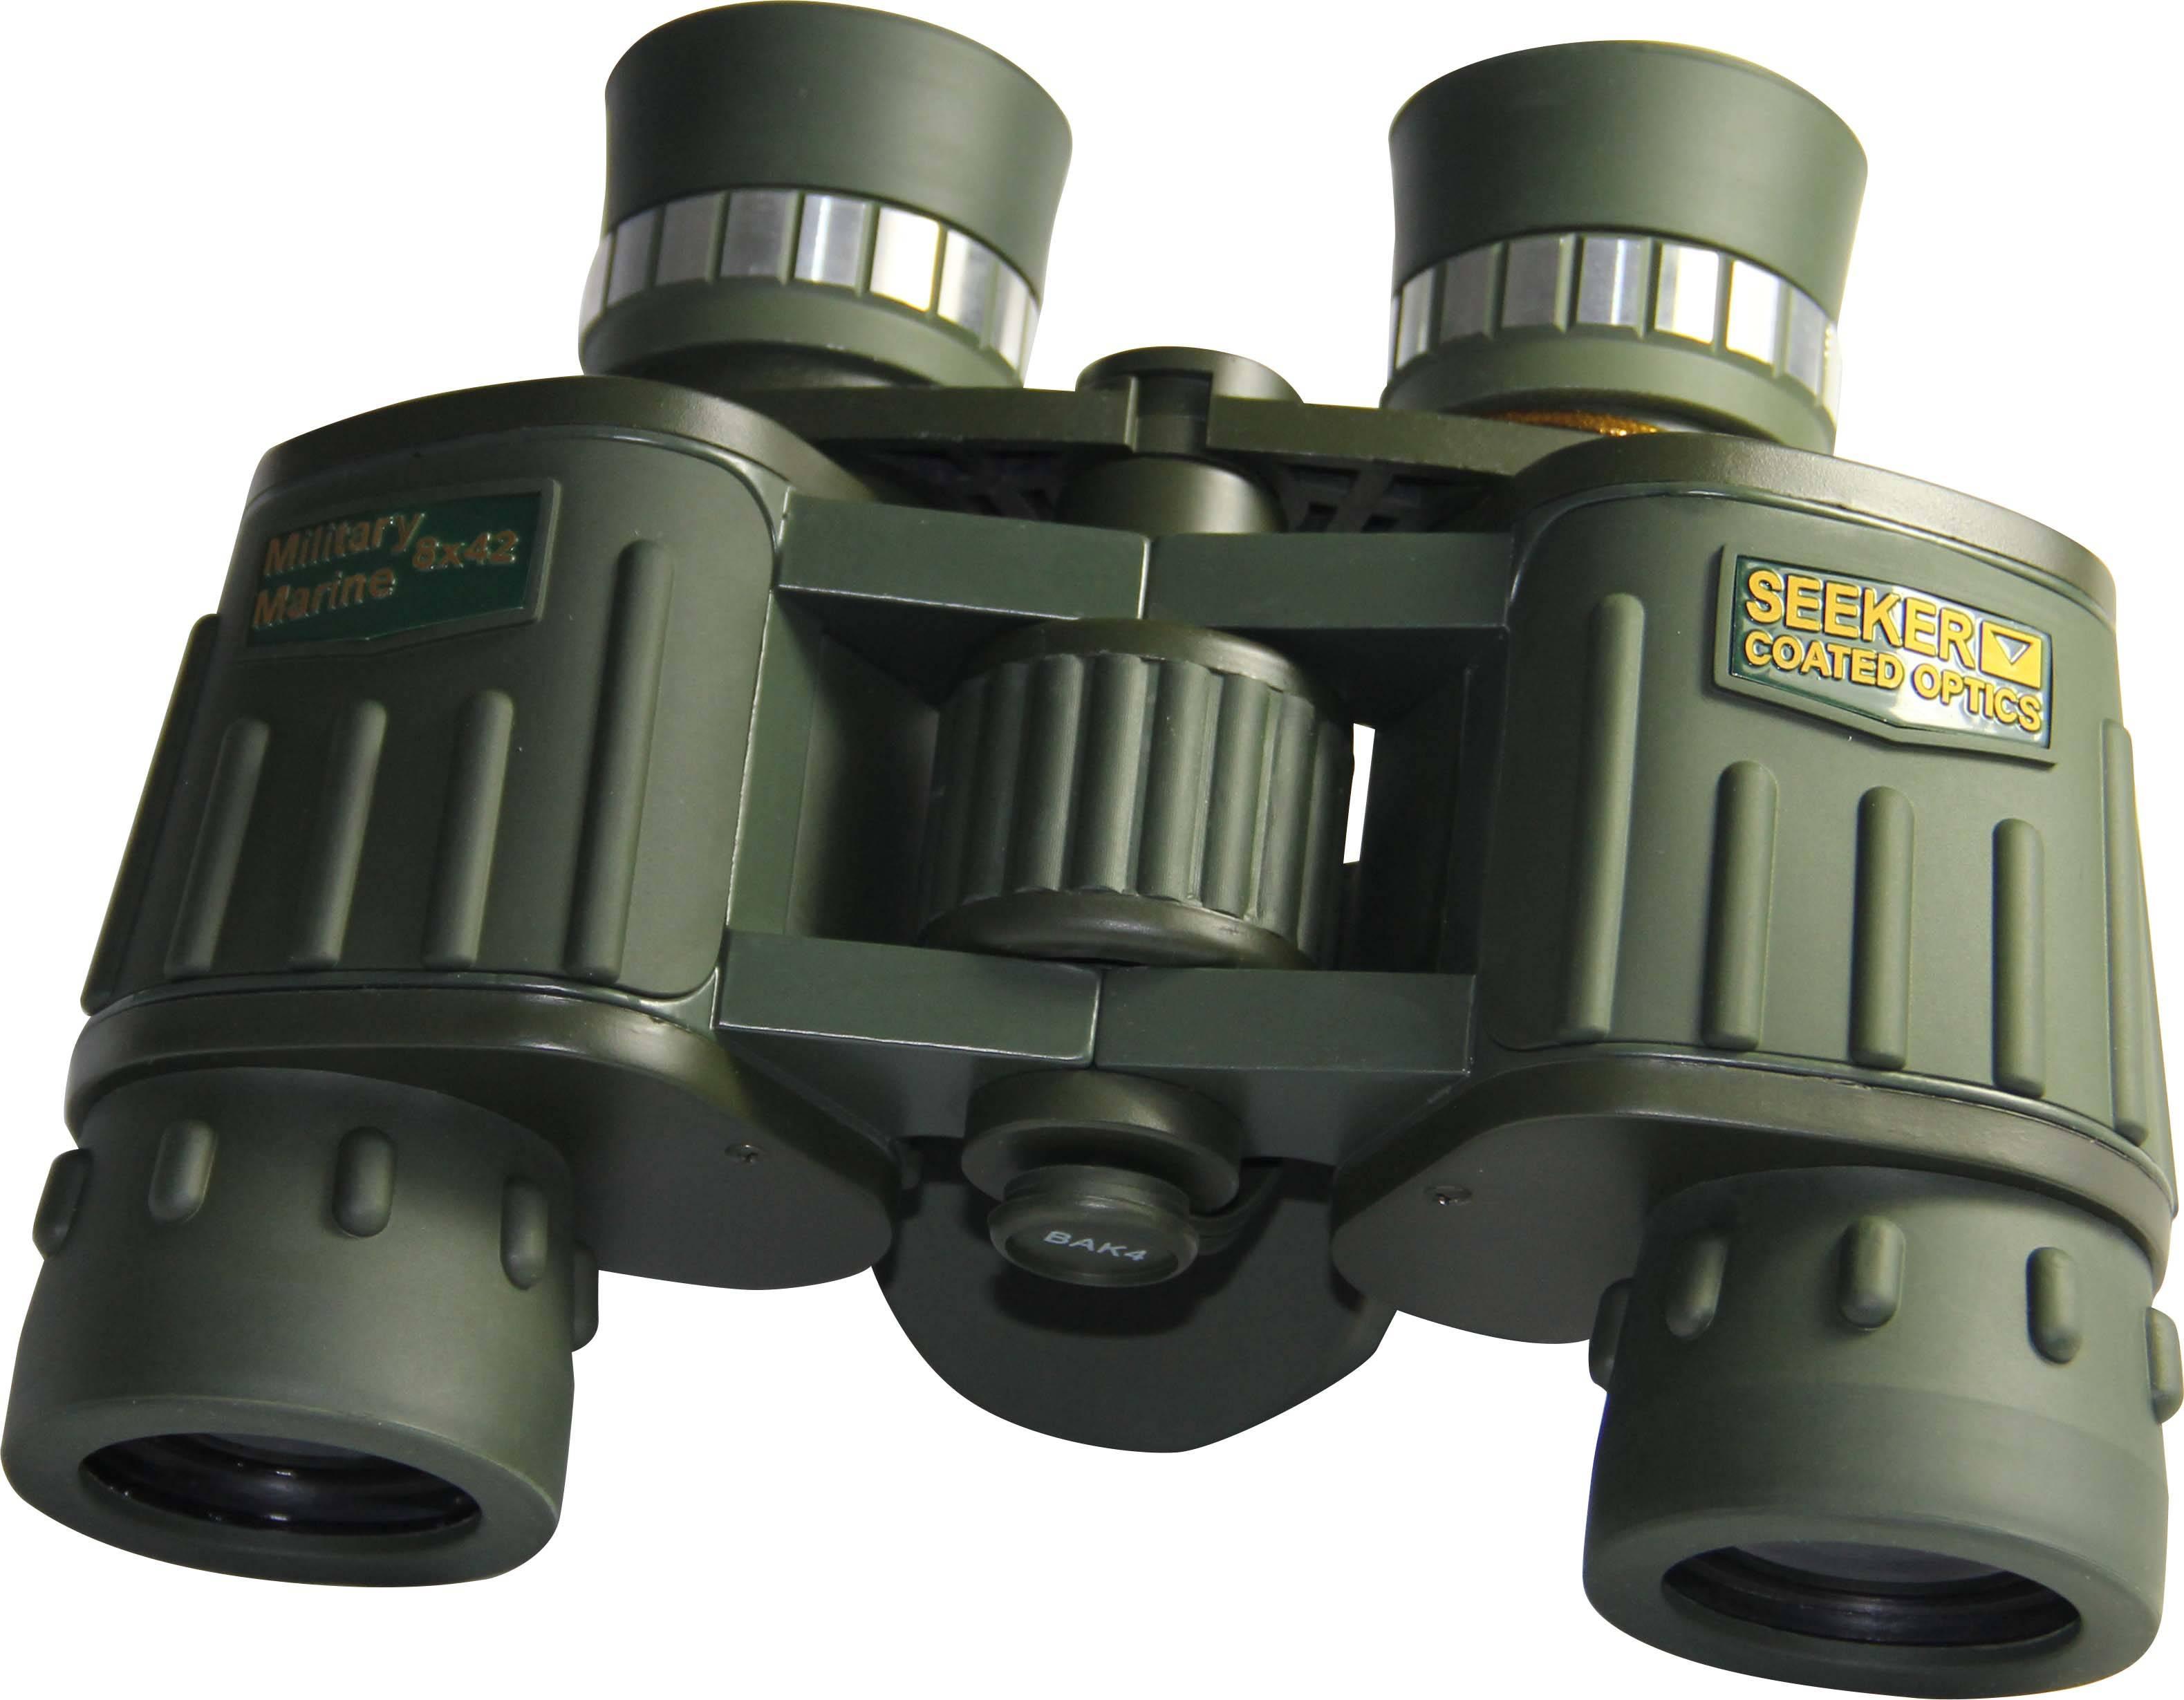 (BM-5002) 8x42 wide angle army marine binoculars